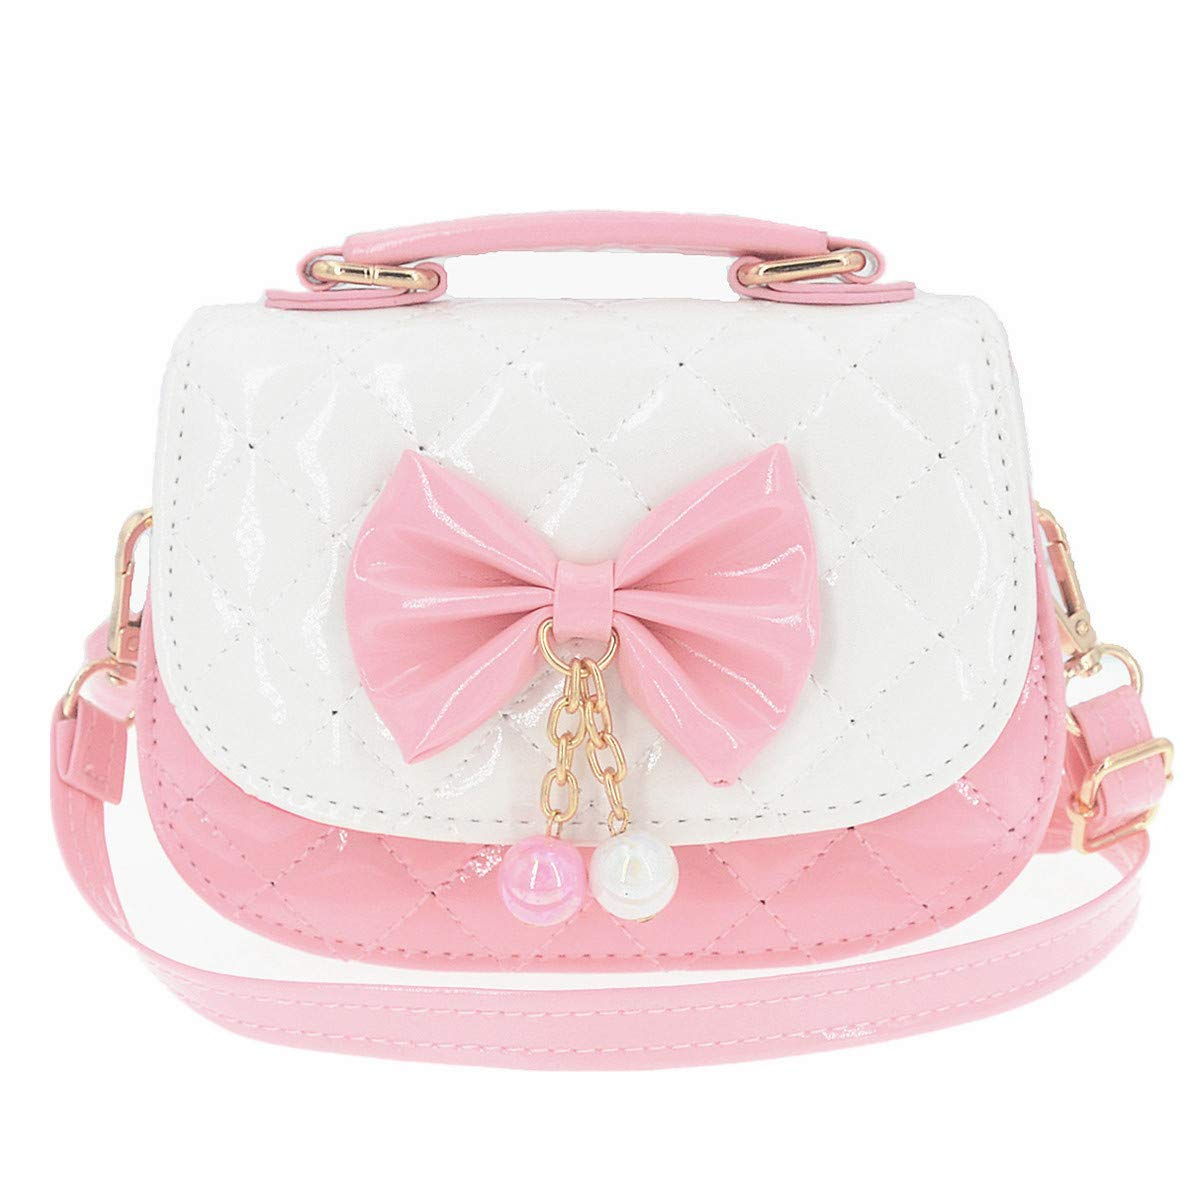 JUNOAI Little Girls Crossbody Purses for Kids - Toddler Mini Cute Princess Handbags Shoulder Messenger Bag Toys Gifts (Bowknot Pink&White)